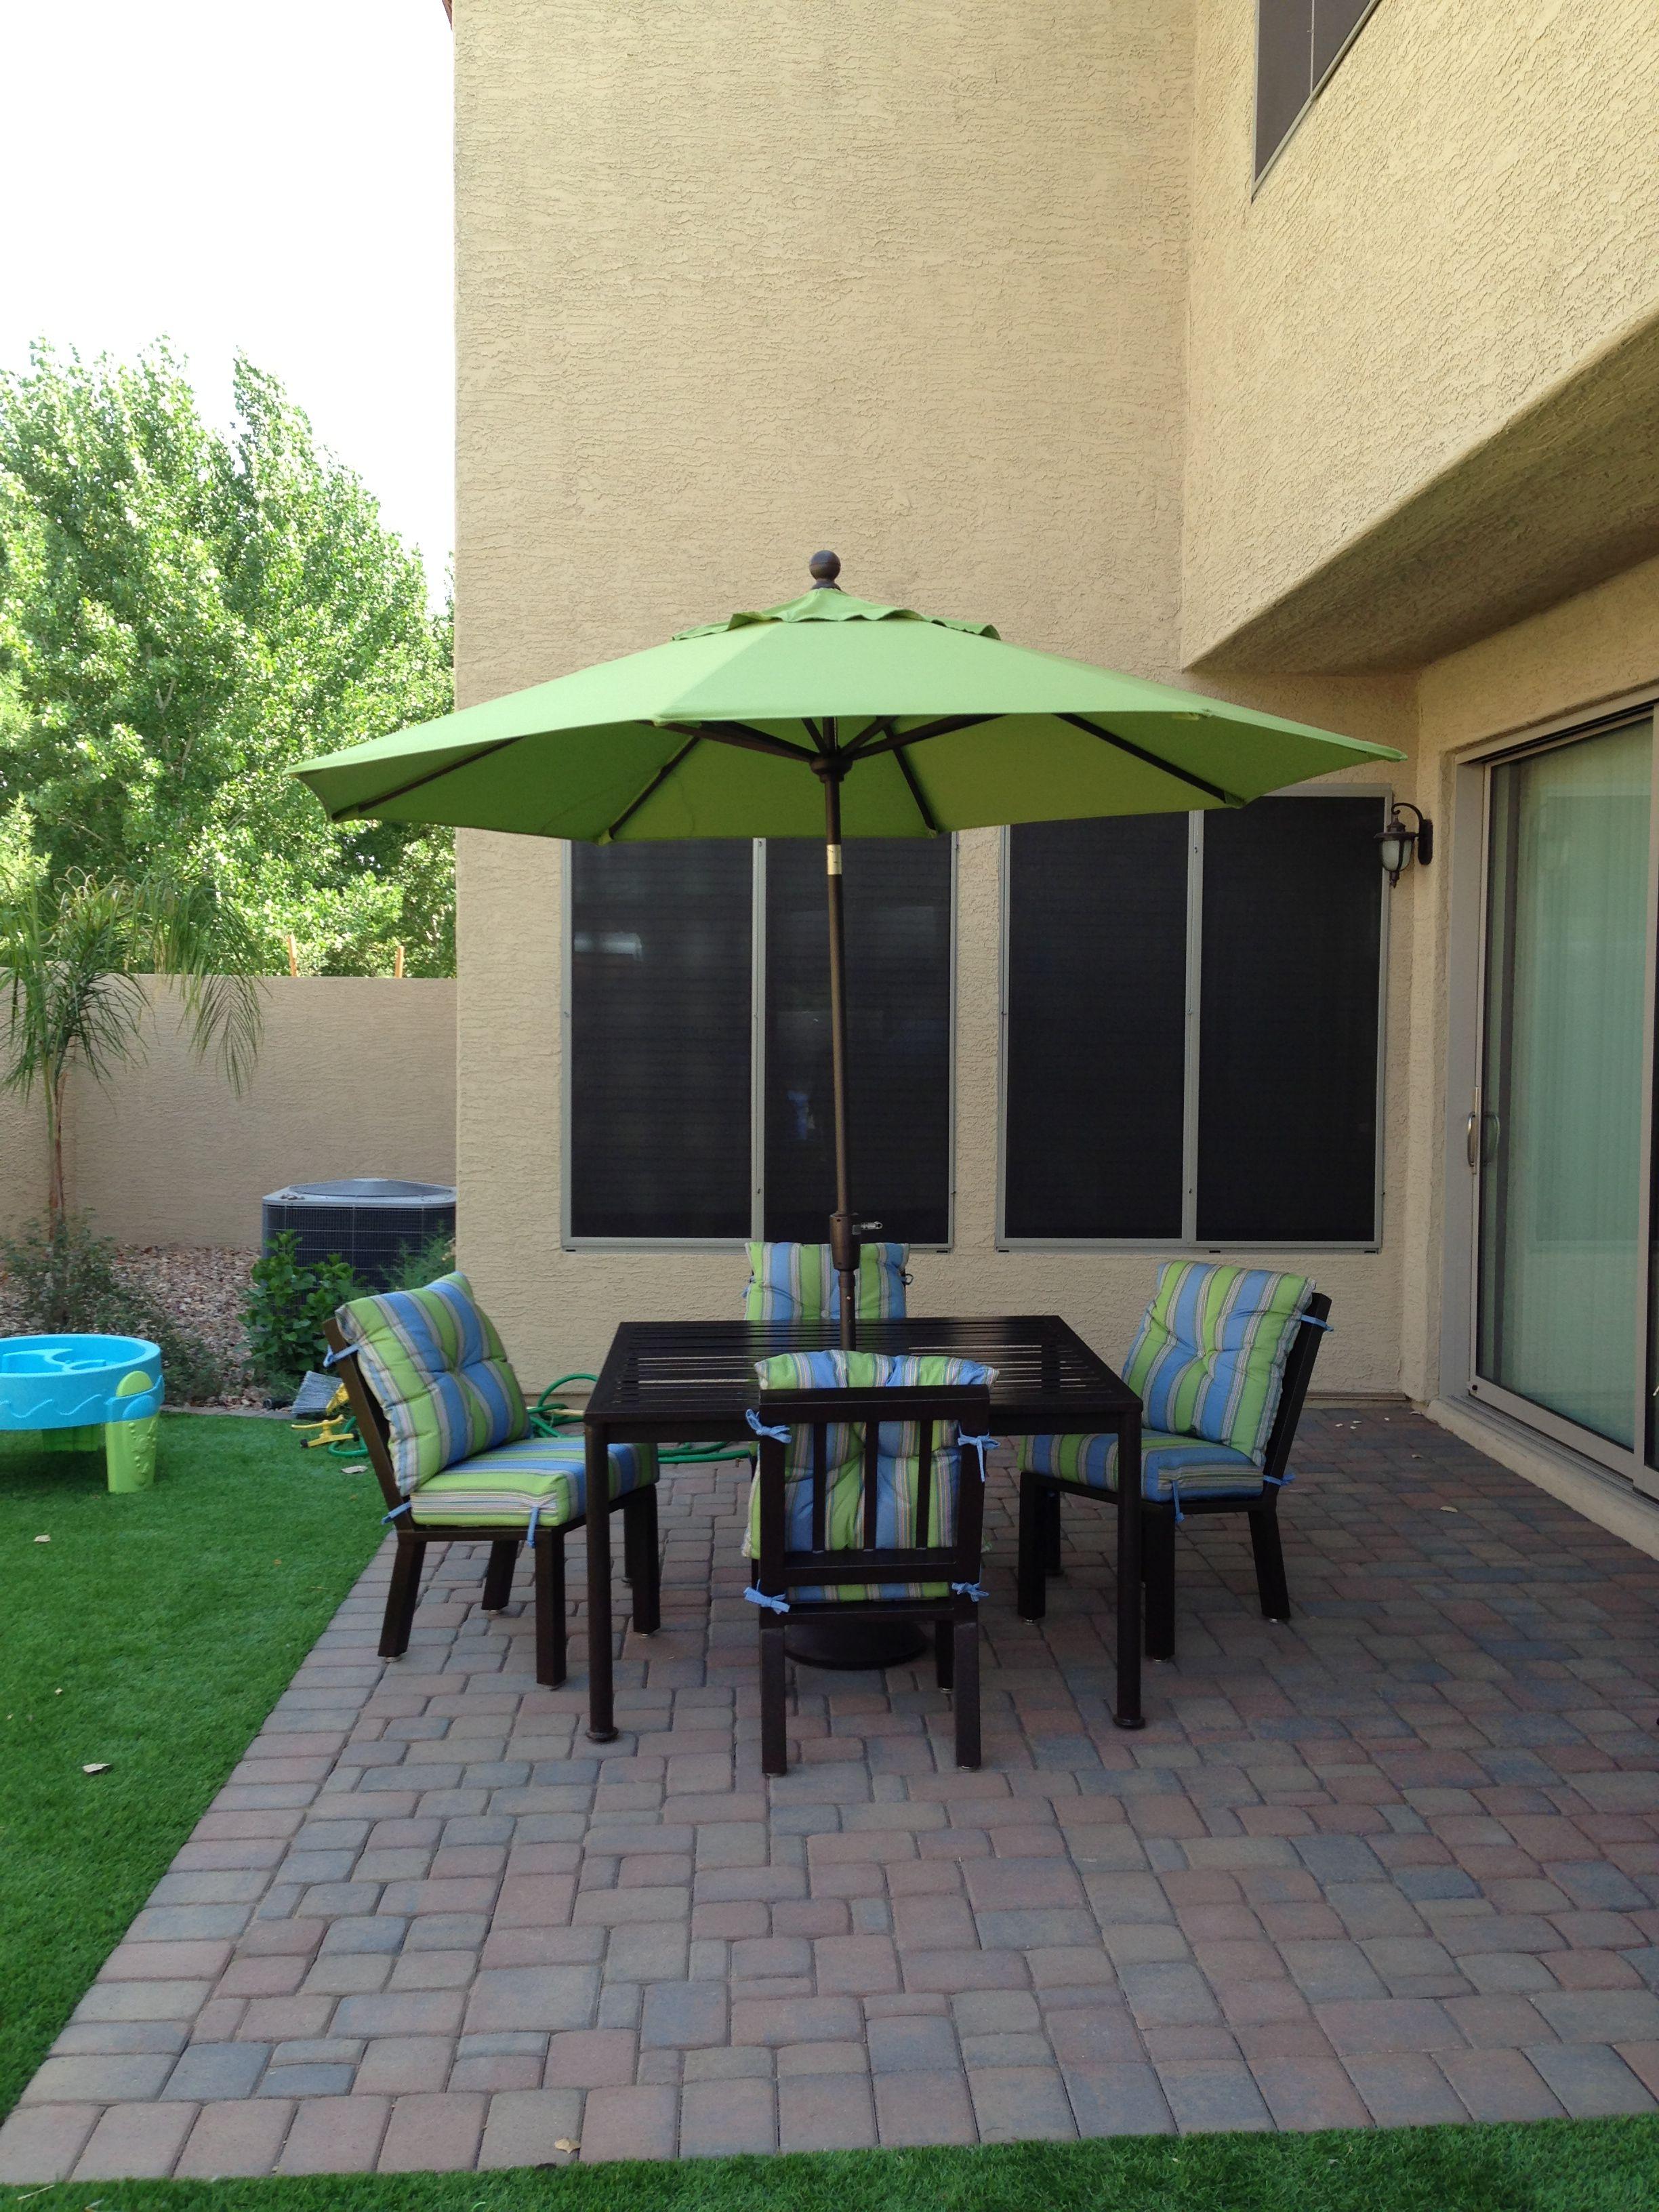 Charmant Umbrella In Dining Set